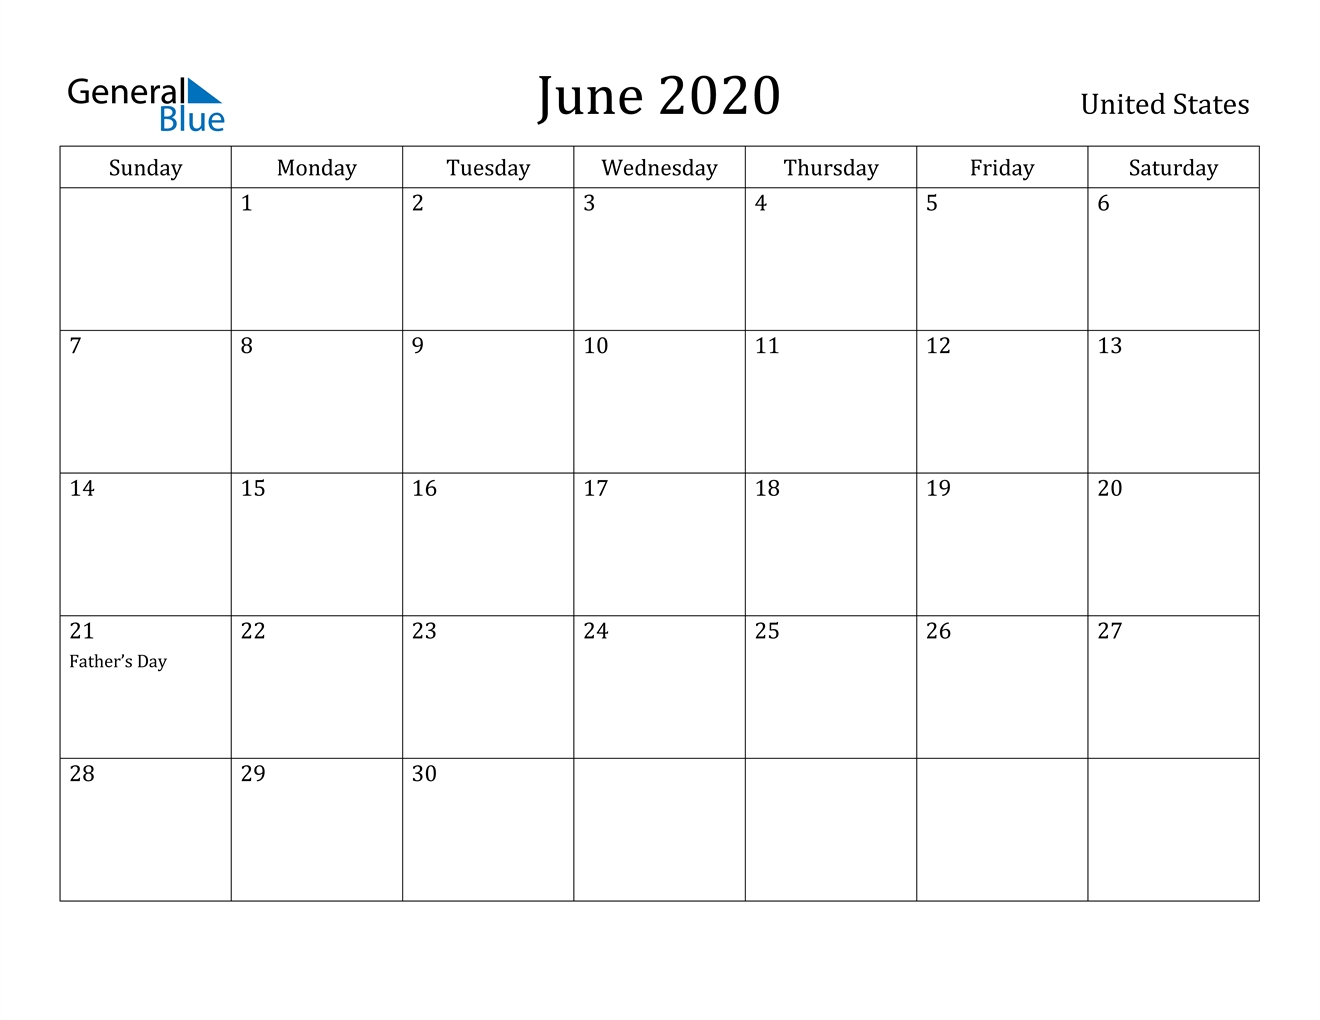 June 2020 Calendar - United States